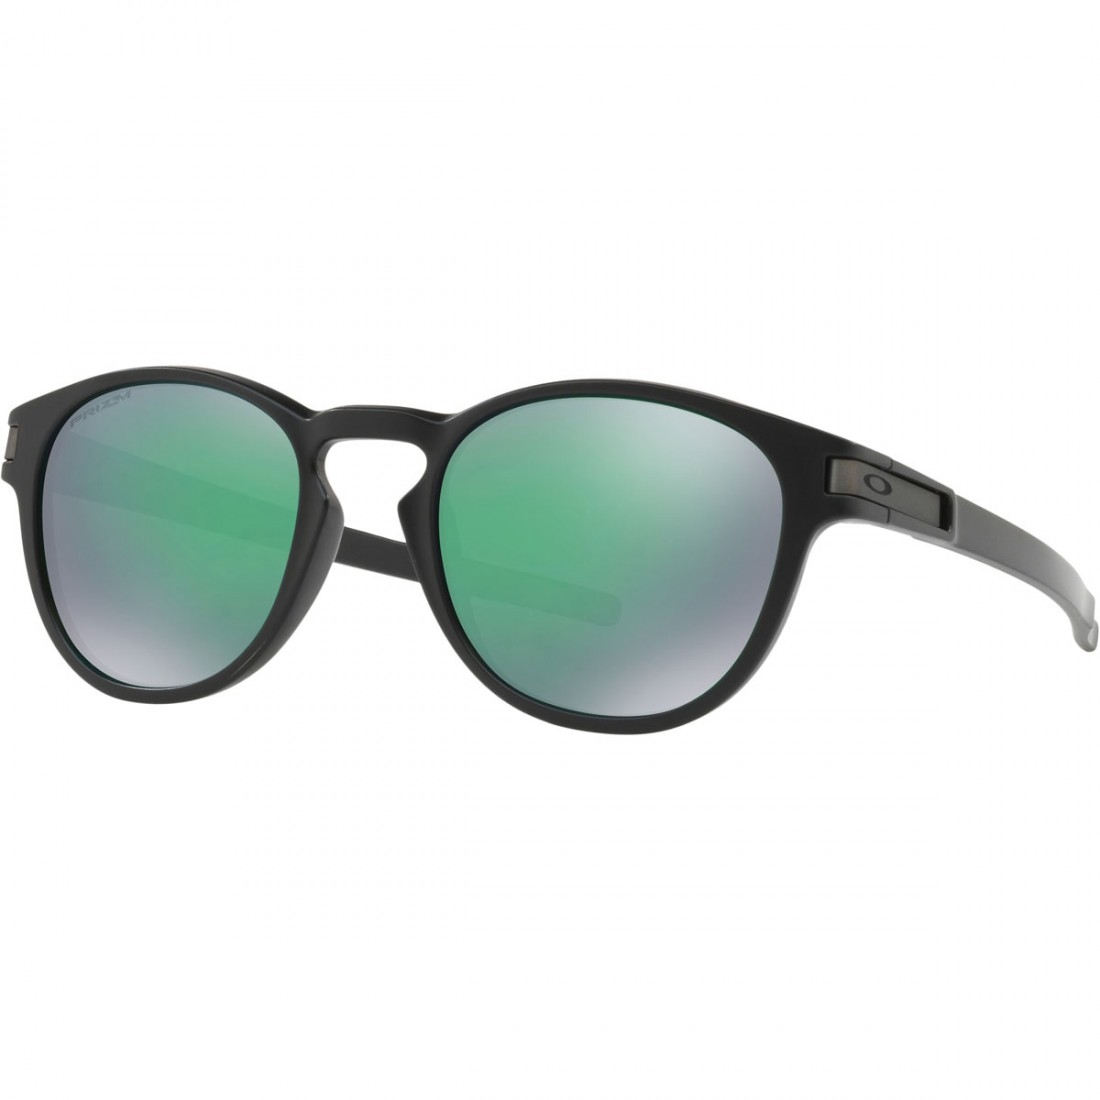 a6739198c4 OAKLEY Latch Matte Black   Prizm Jade Sun glasses · Motocard